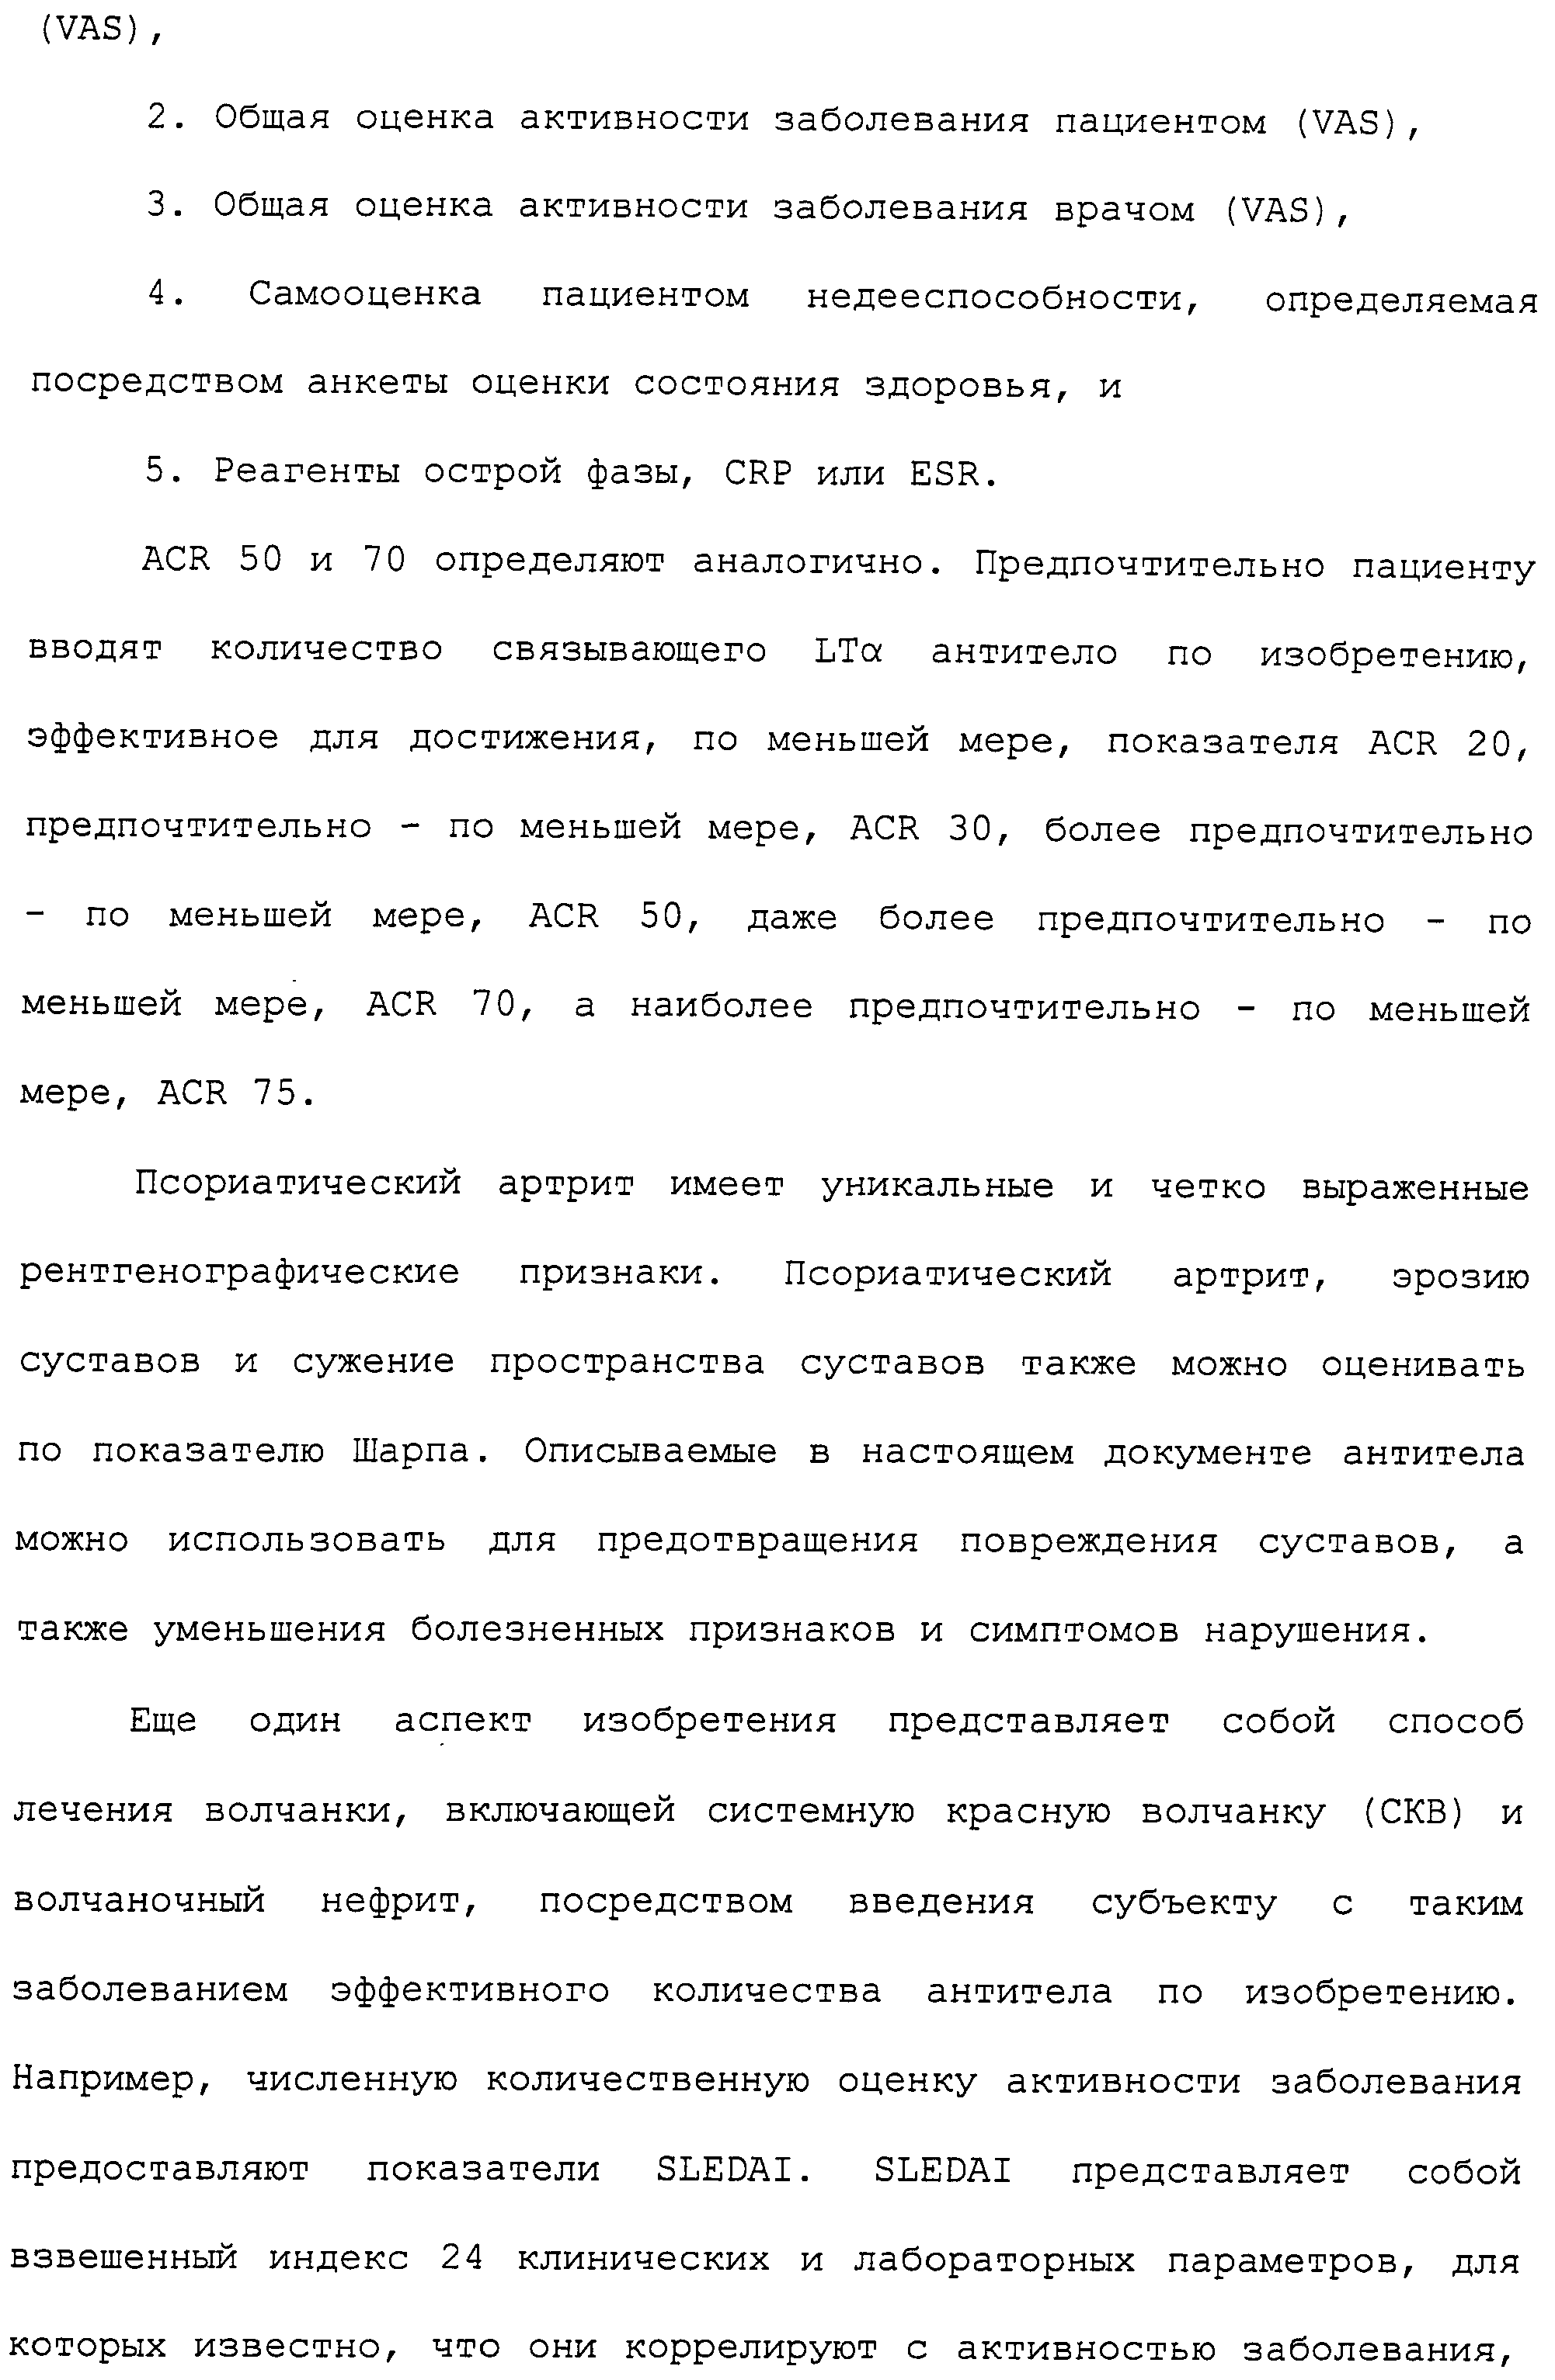 Figure 00000205